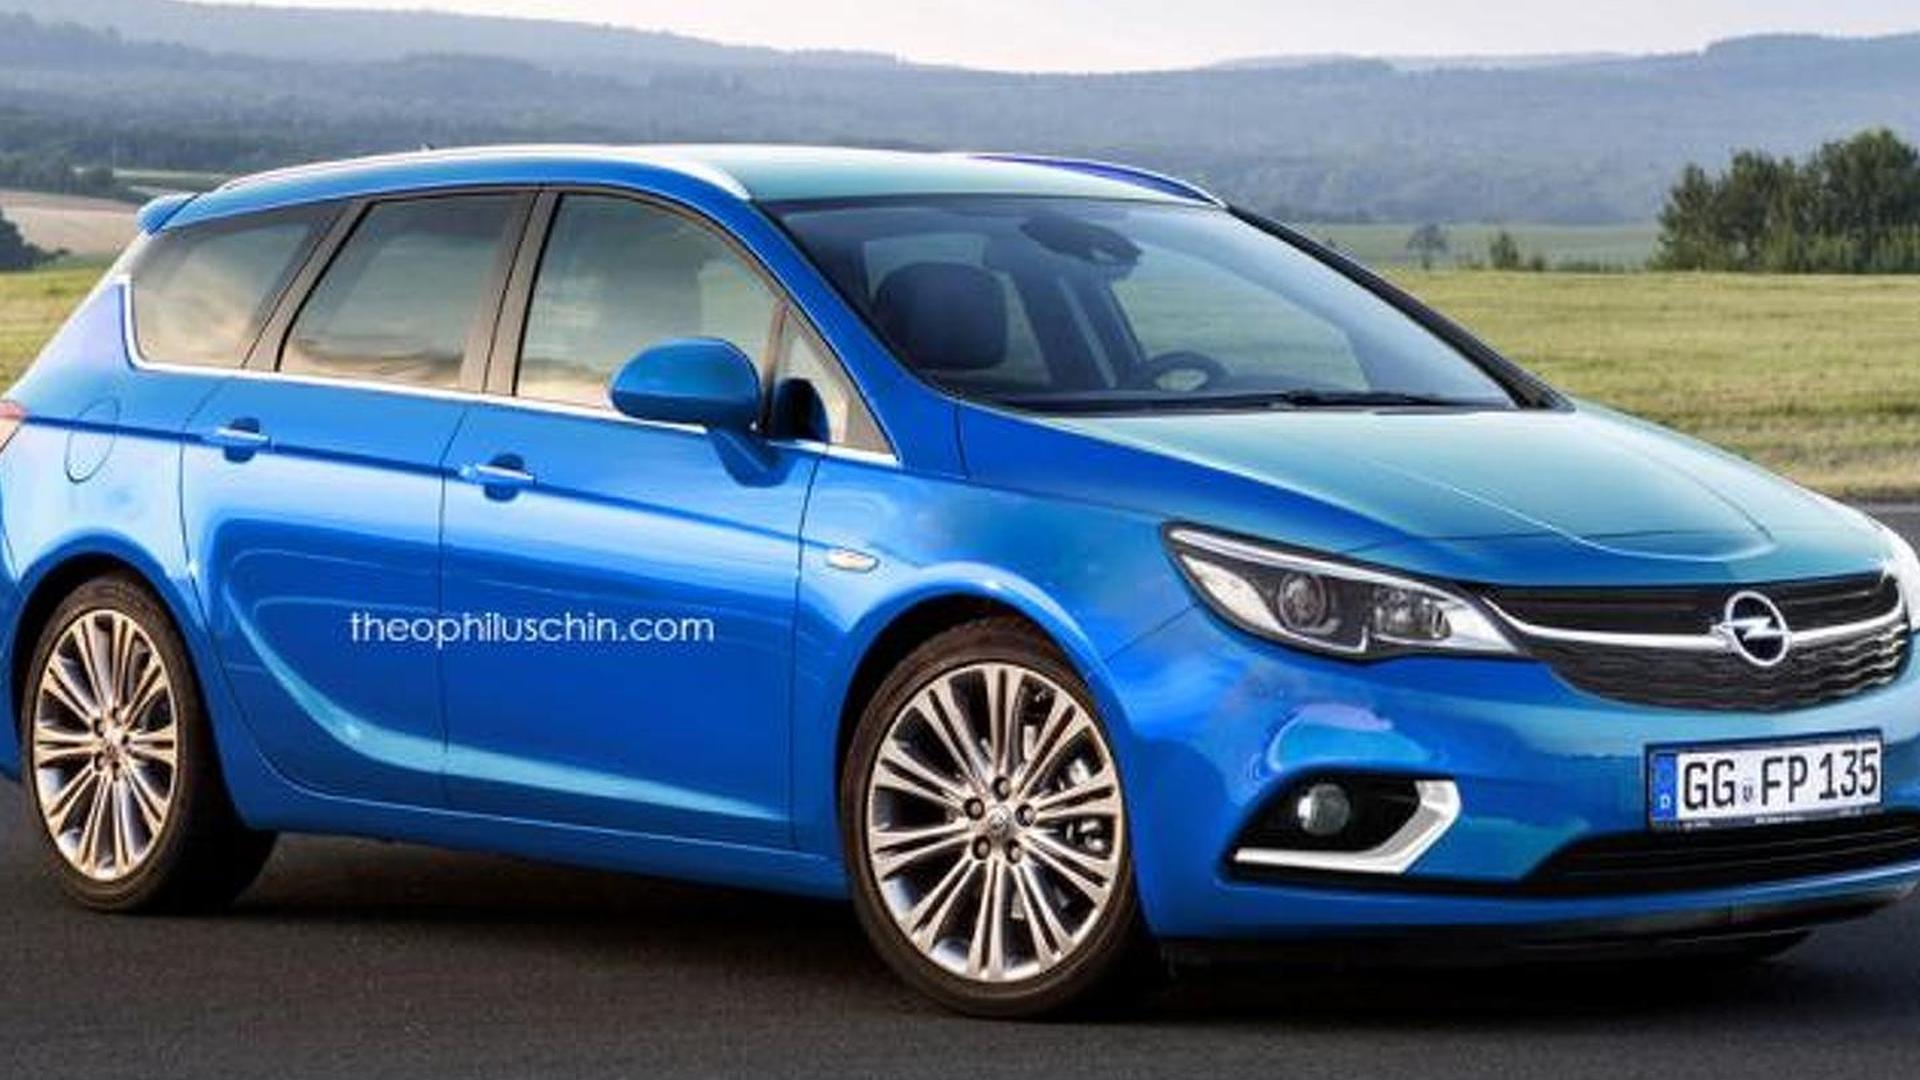 Favorite Opel Astra Sports Tourer